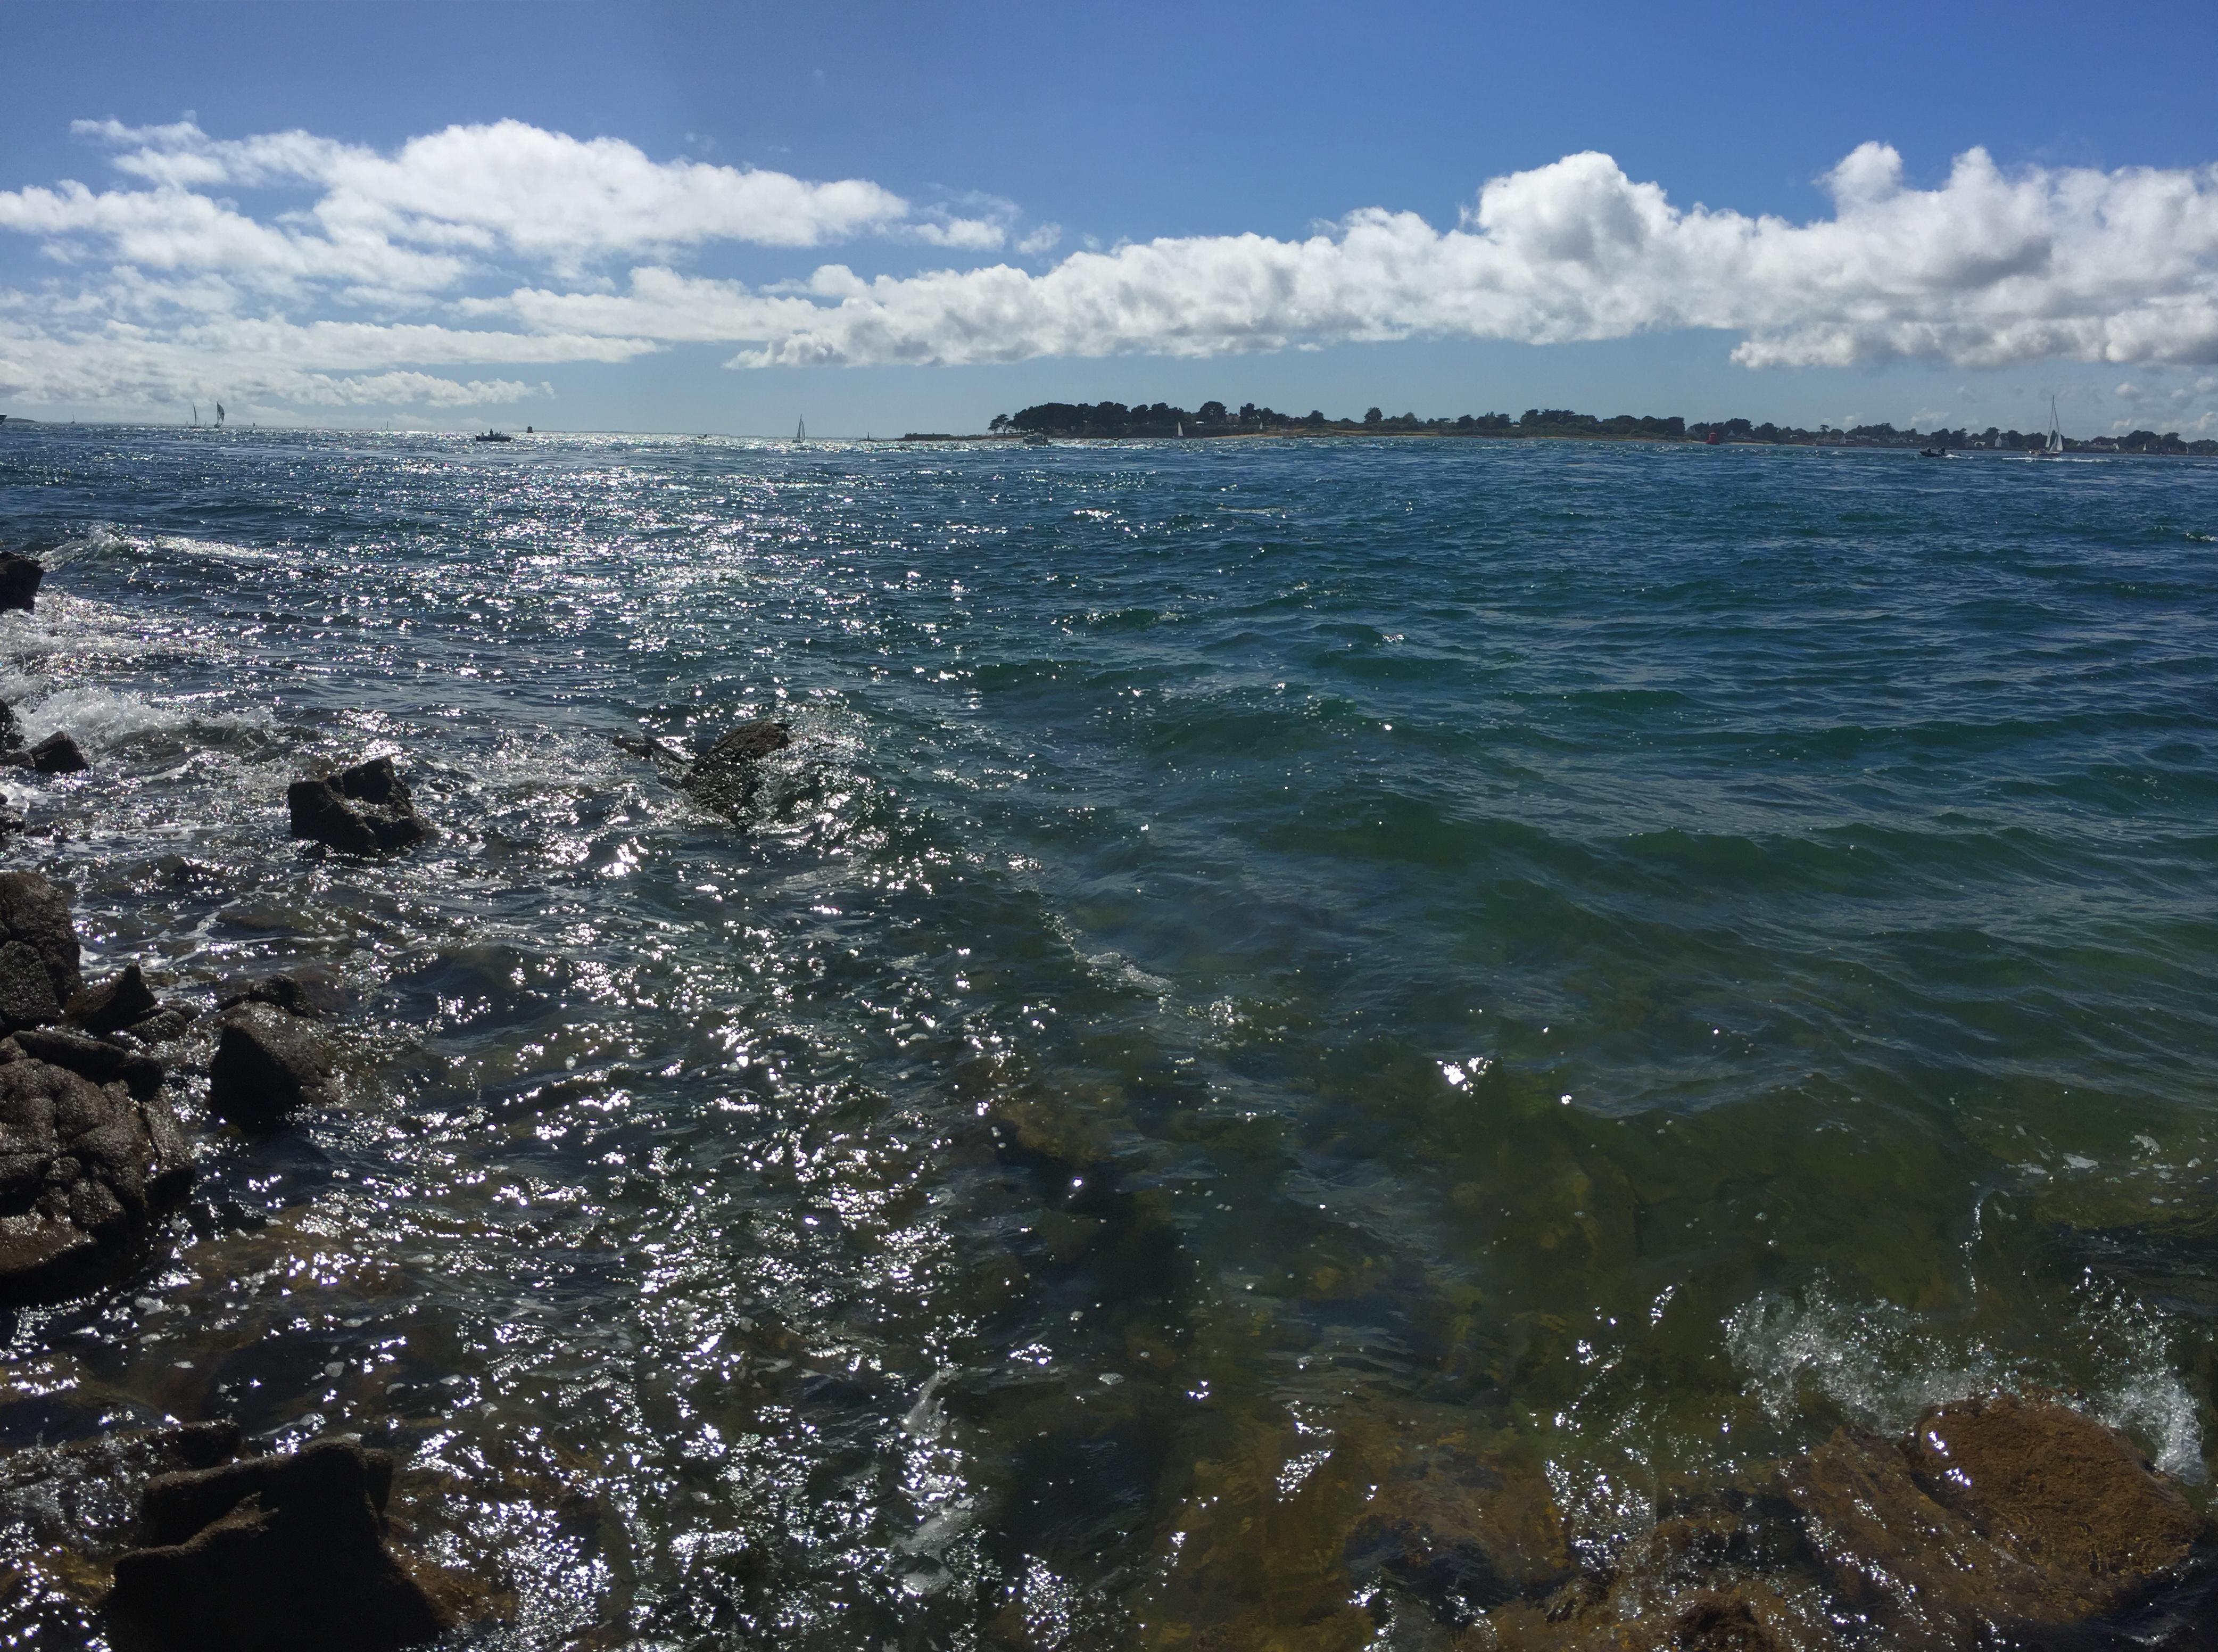 mer à auzon